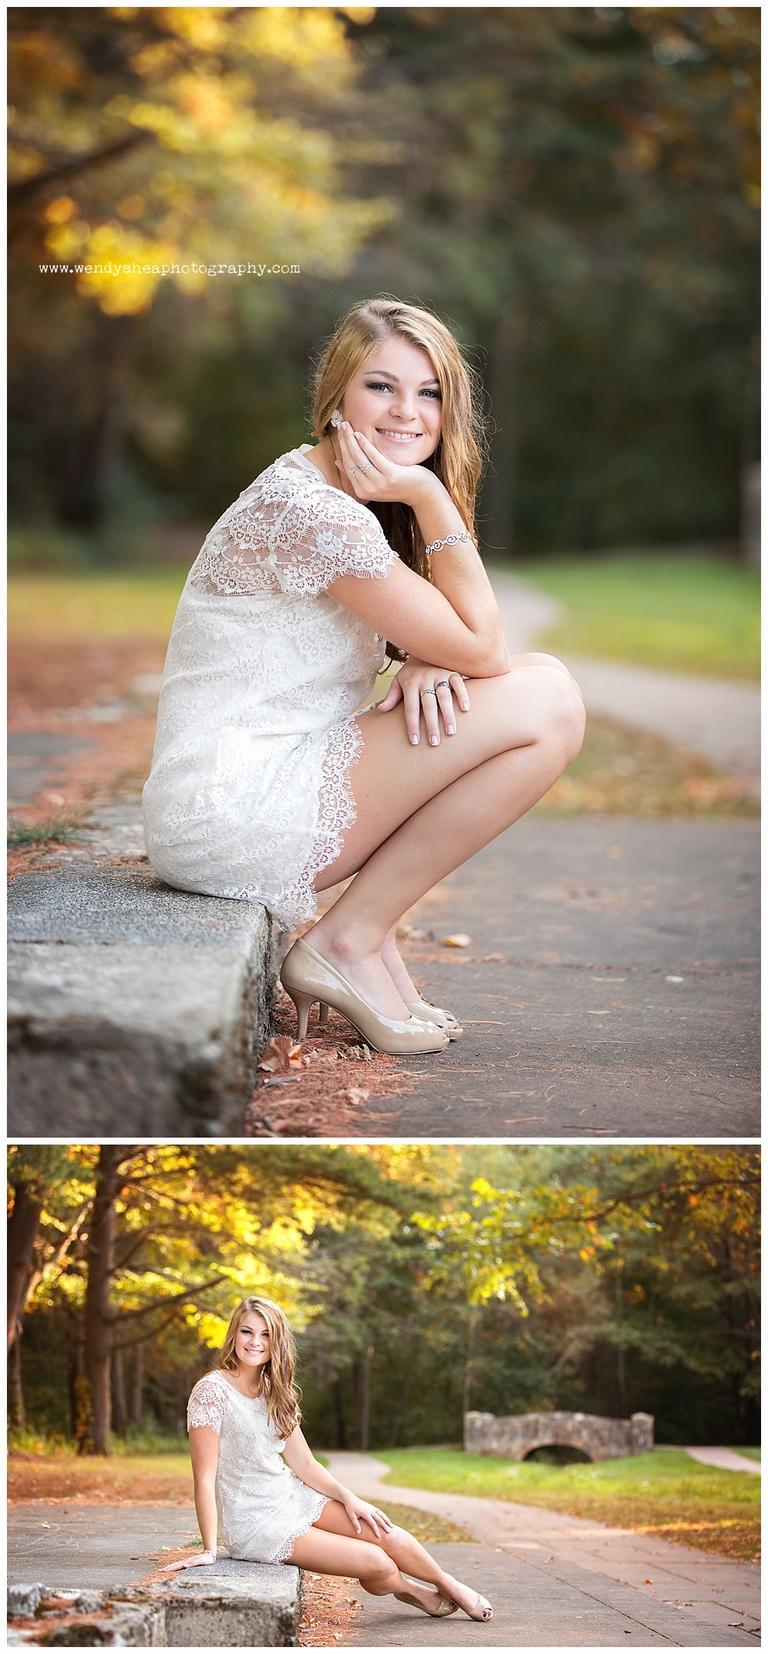 Wendy_Shea_Photography_Seniors_Massachusetts_Photographer_Medway_0859